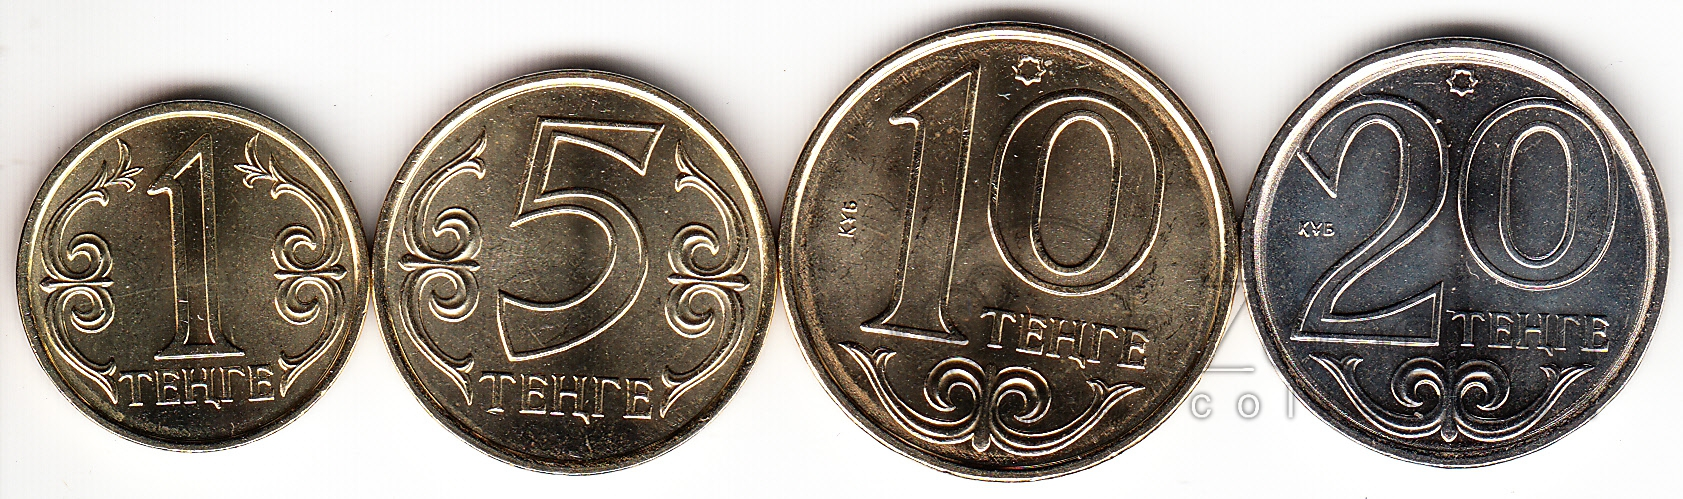 Казахстан набор 4 монеты 1, 5, 10 и 20 тенге 2012. ZooCoin